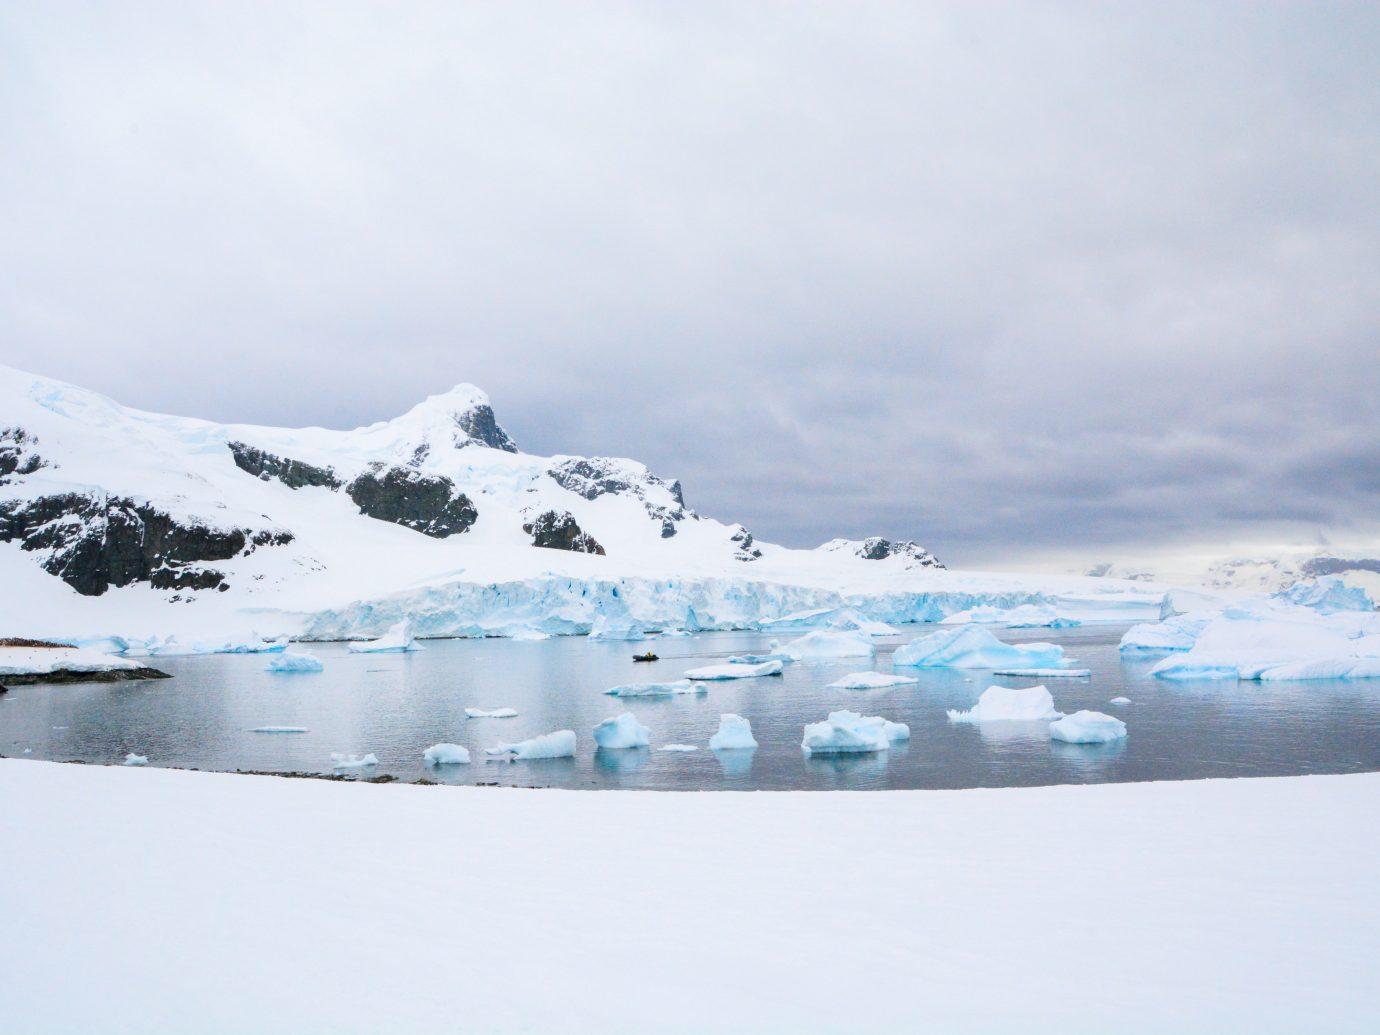 Cuverville Island icebergs